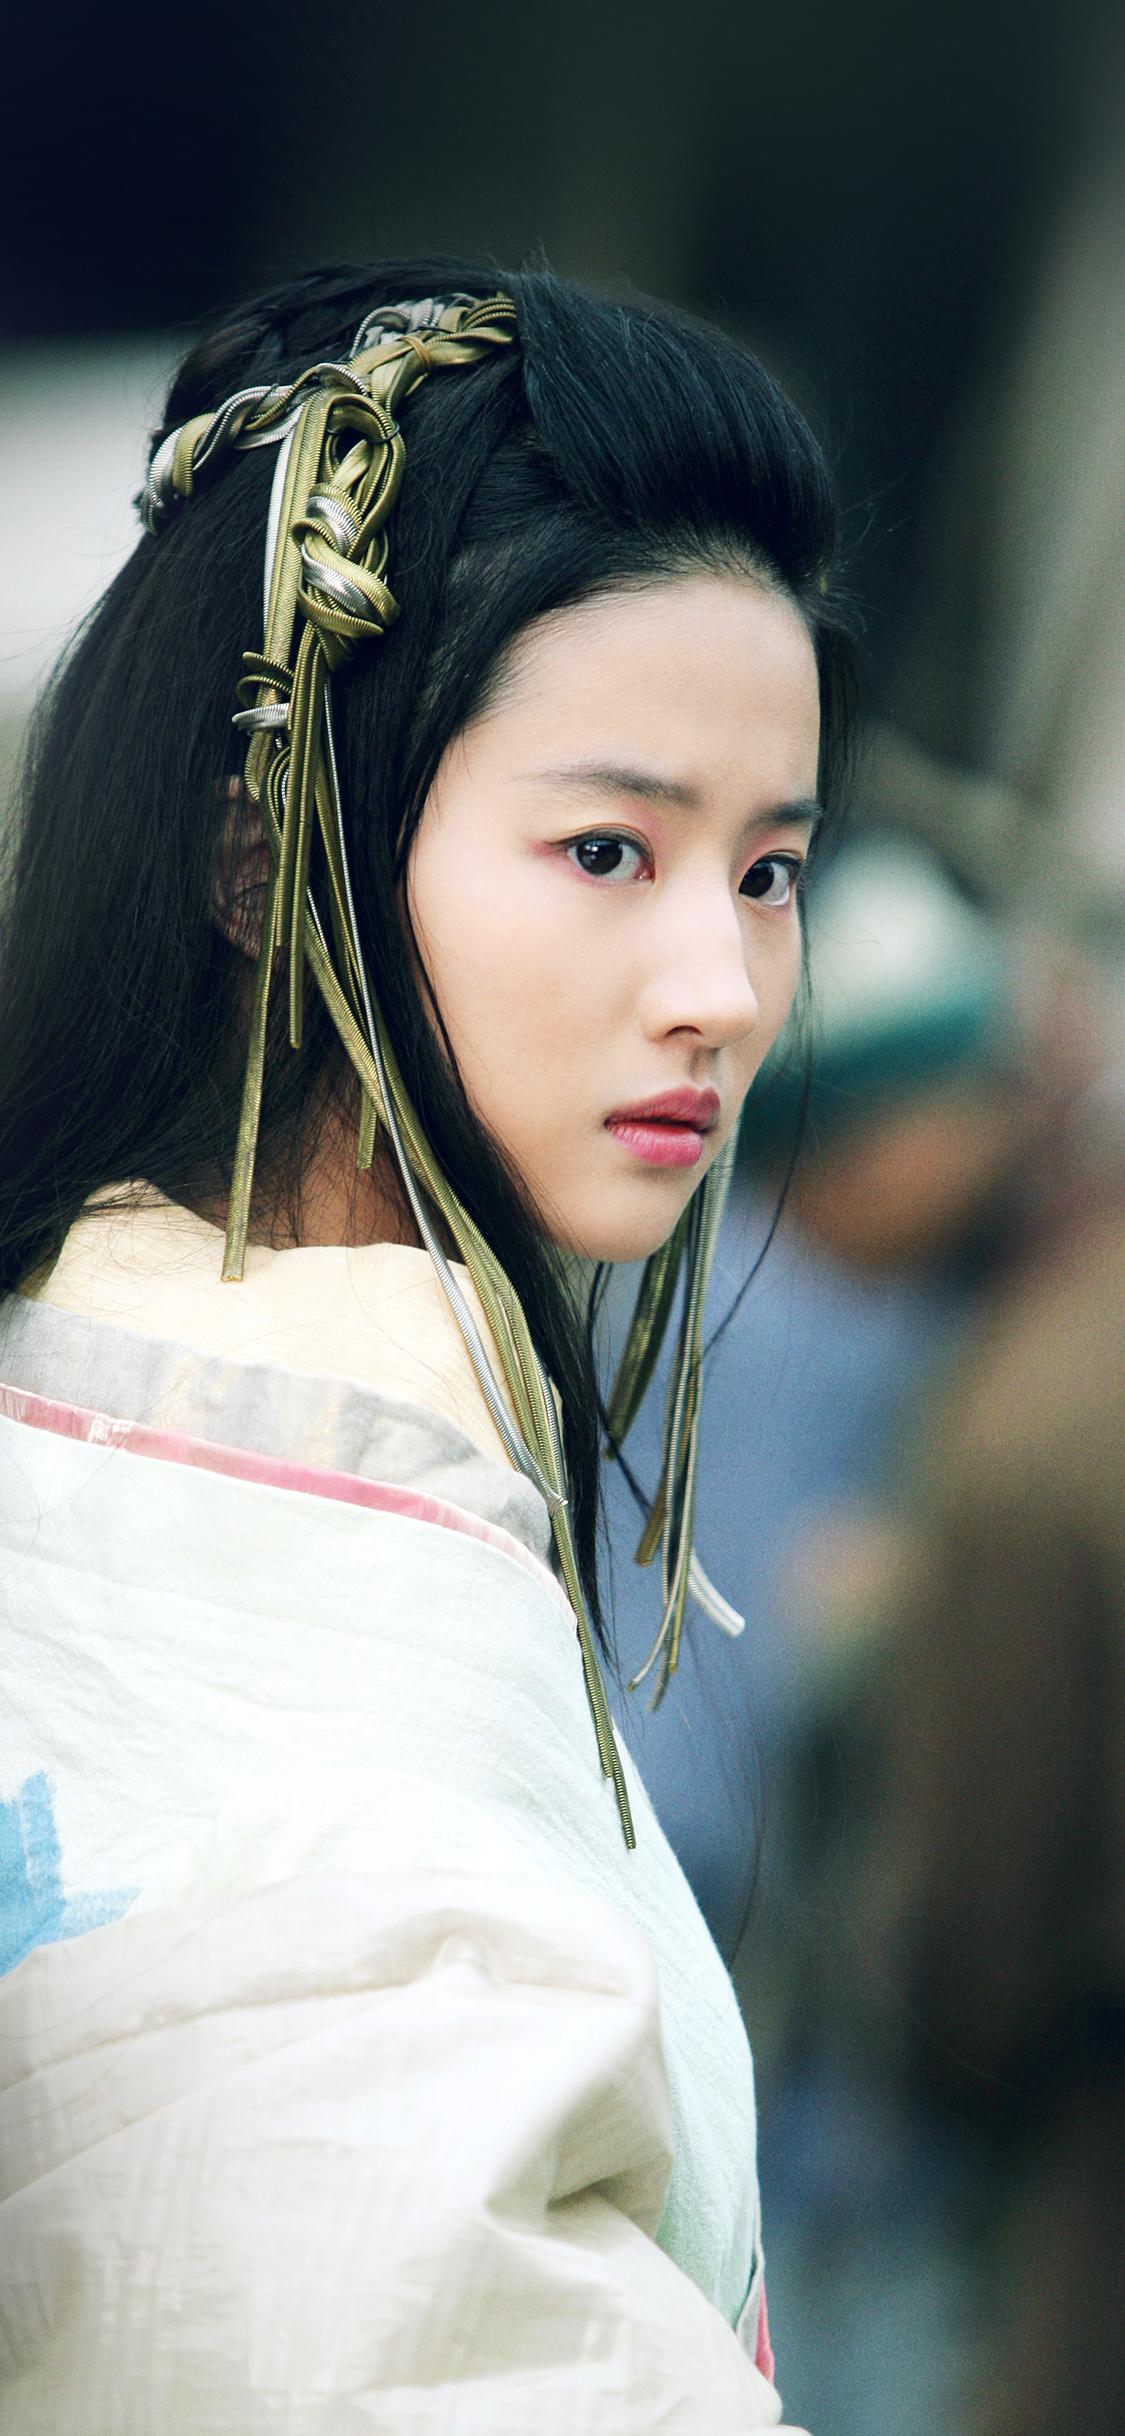 iPhoneXpapers.com-Apple-iPhone-wallpaper-hf81-liu-yifei-china-star-film-actress-model-singer